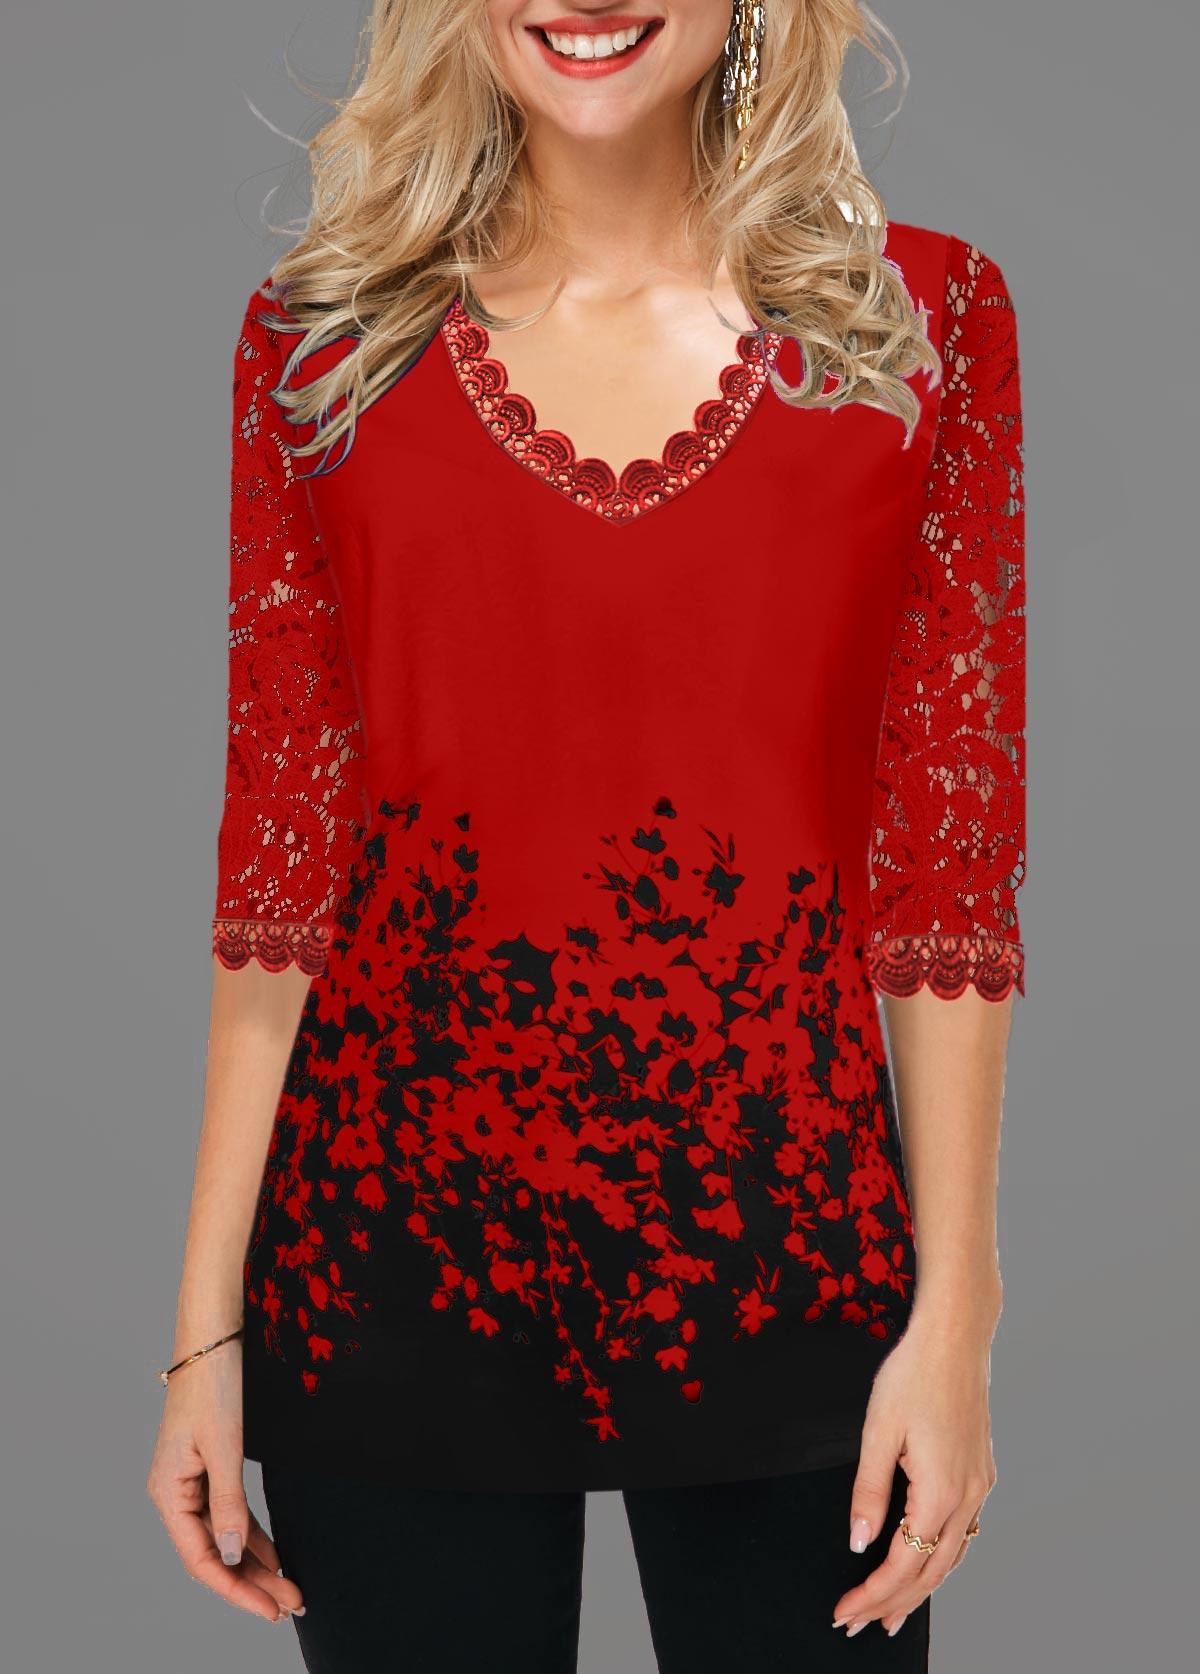 Lace Panel Floral Print V Neck T Shirt